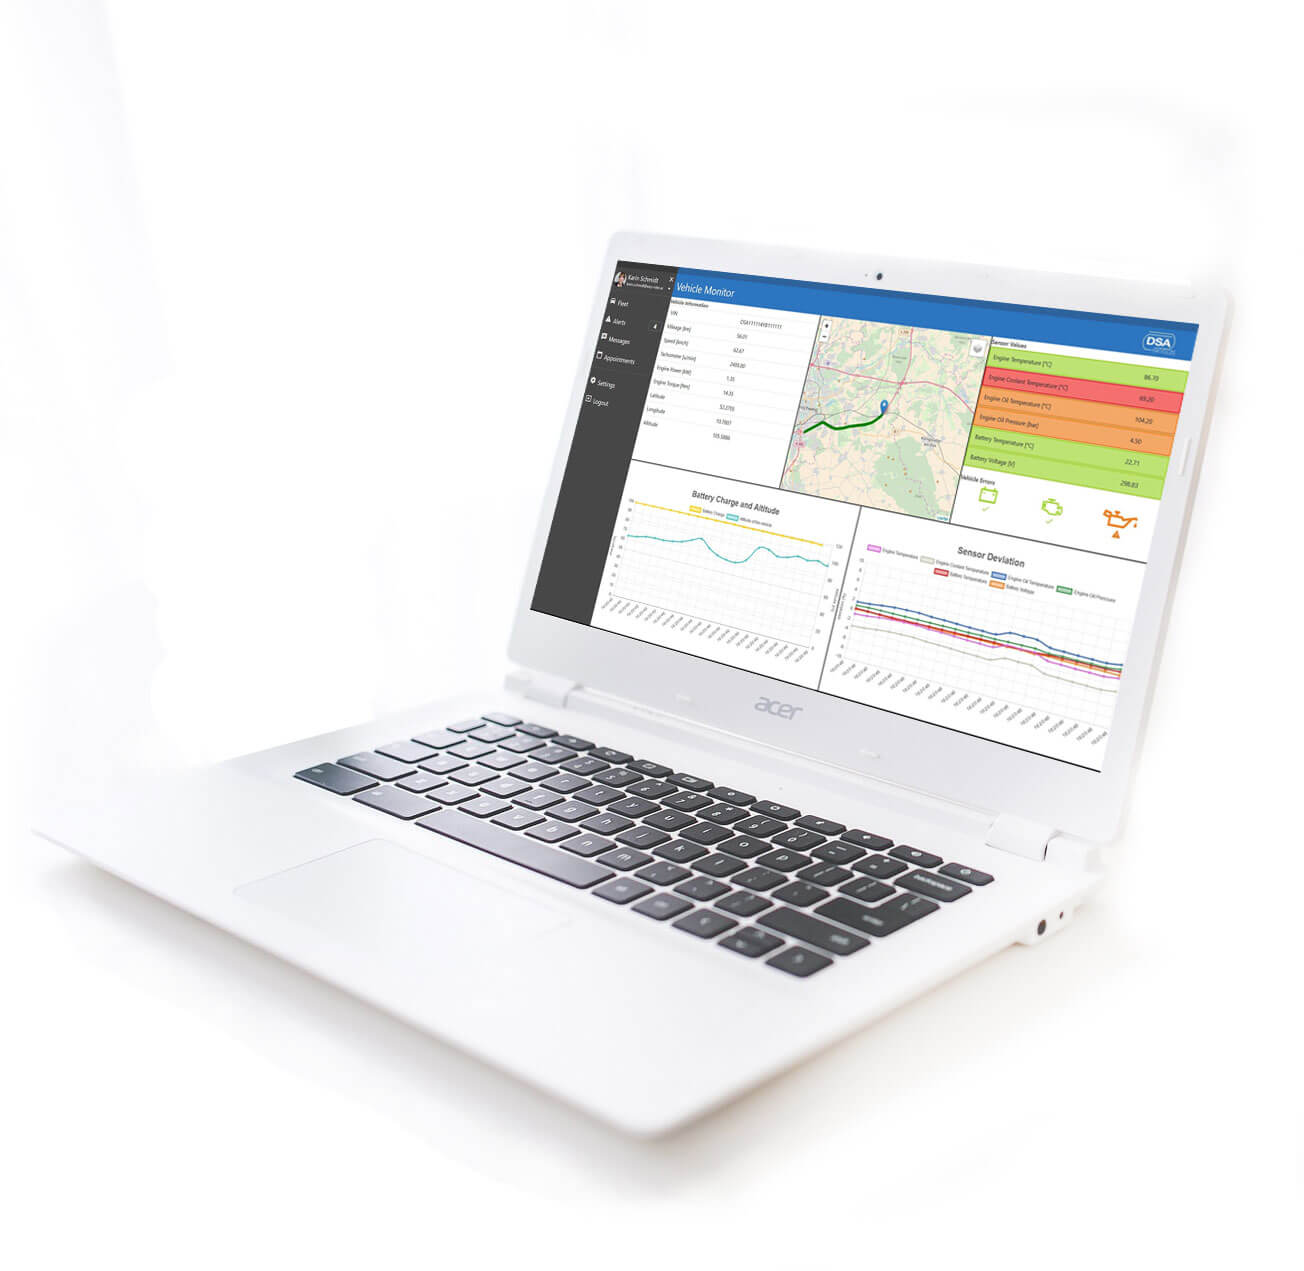 Skylyze DSA Connected Vehicle Analysis